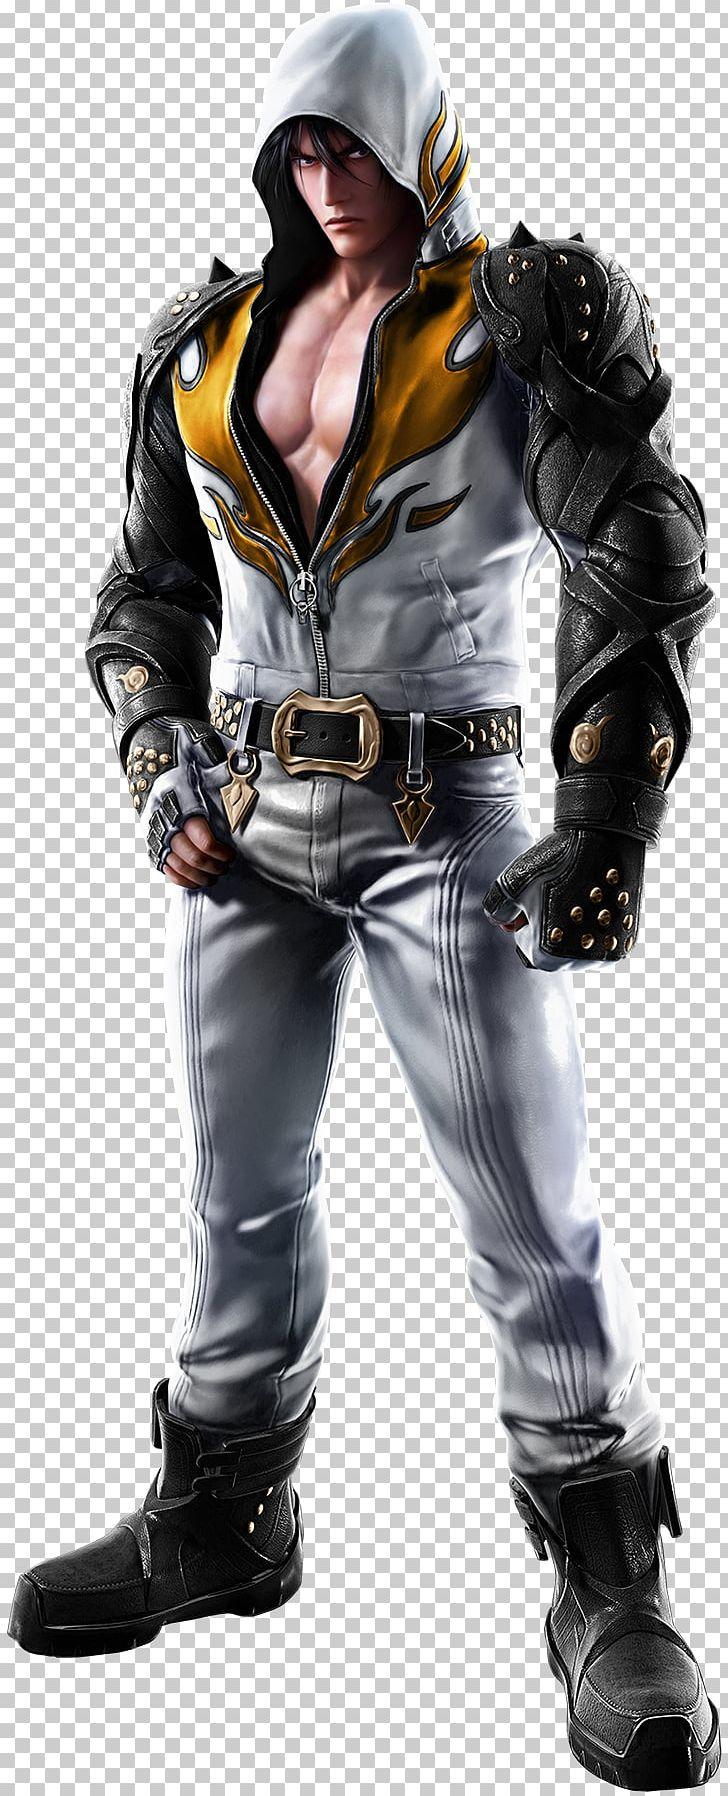 Jin Kazama Tekken 7 Tekken 6 Kazuya Mishima Ling Xiaoyu Png Clipart Action Figure Costume Devil